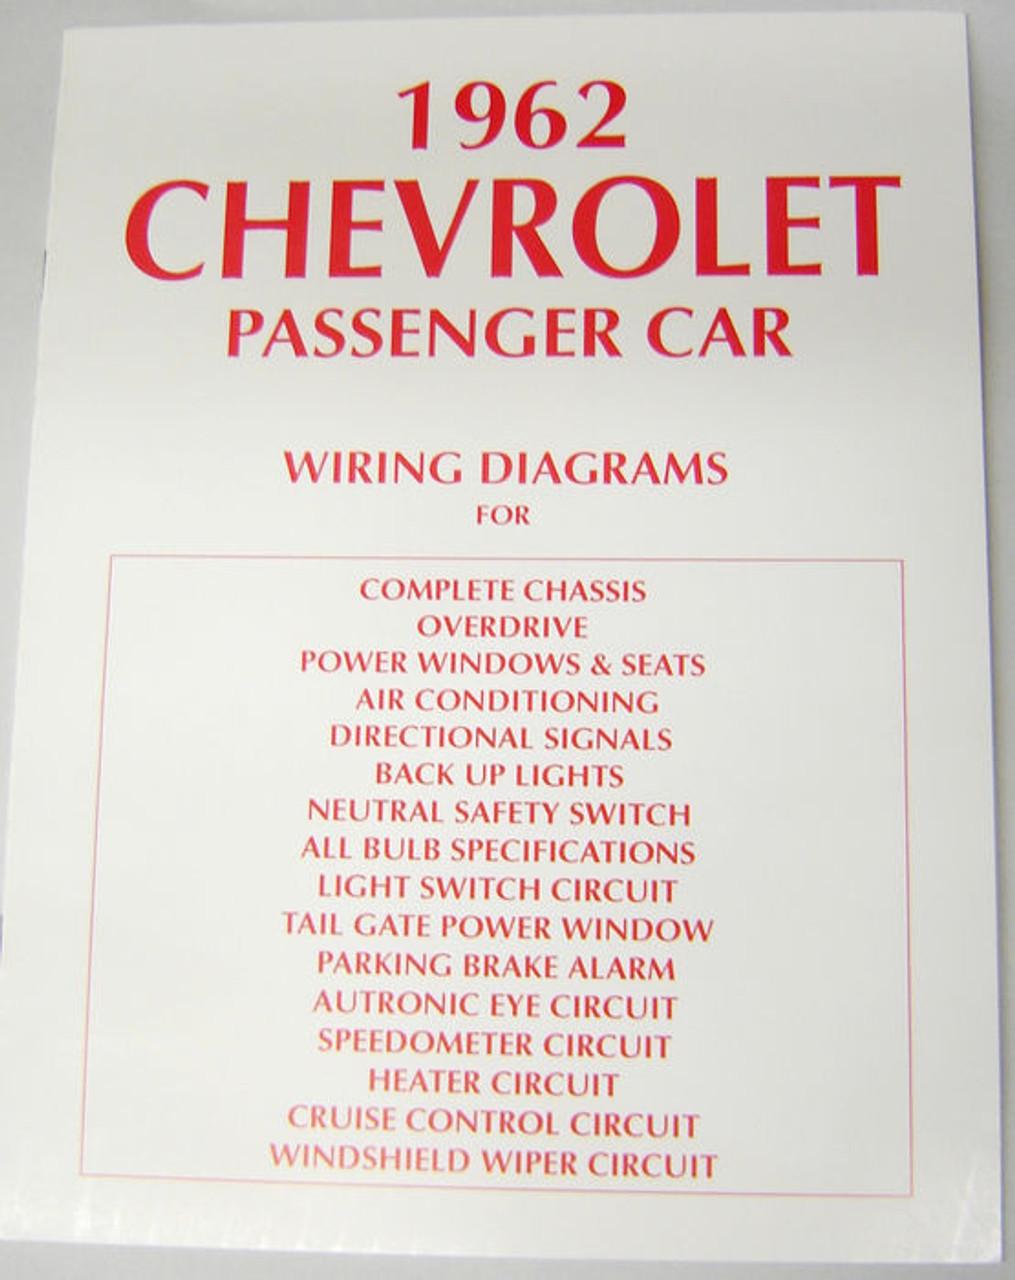 62 chevy impala electrical wiring diagram manual 1962 i 5 classic rh i5chevy com 1962 chevy wiring diagram 1962 chevy truck wiring diagram